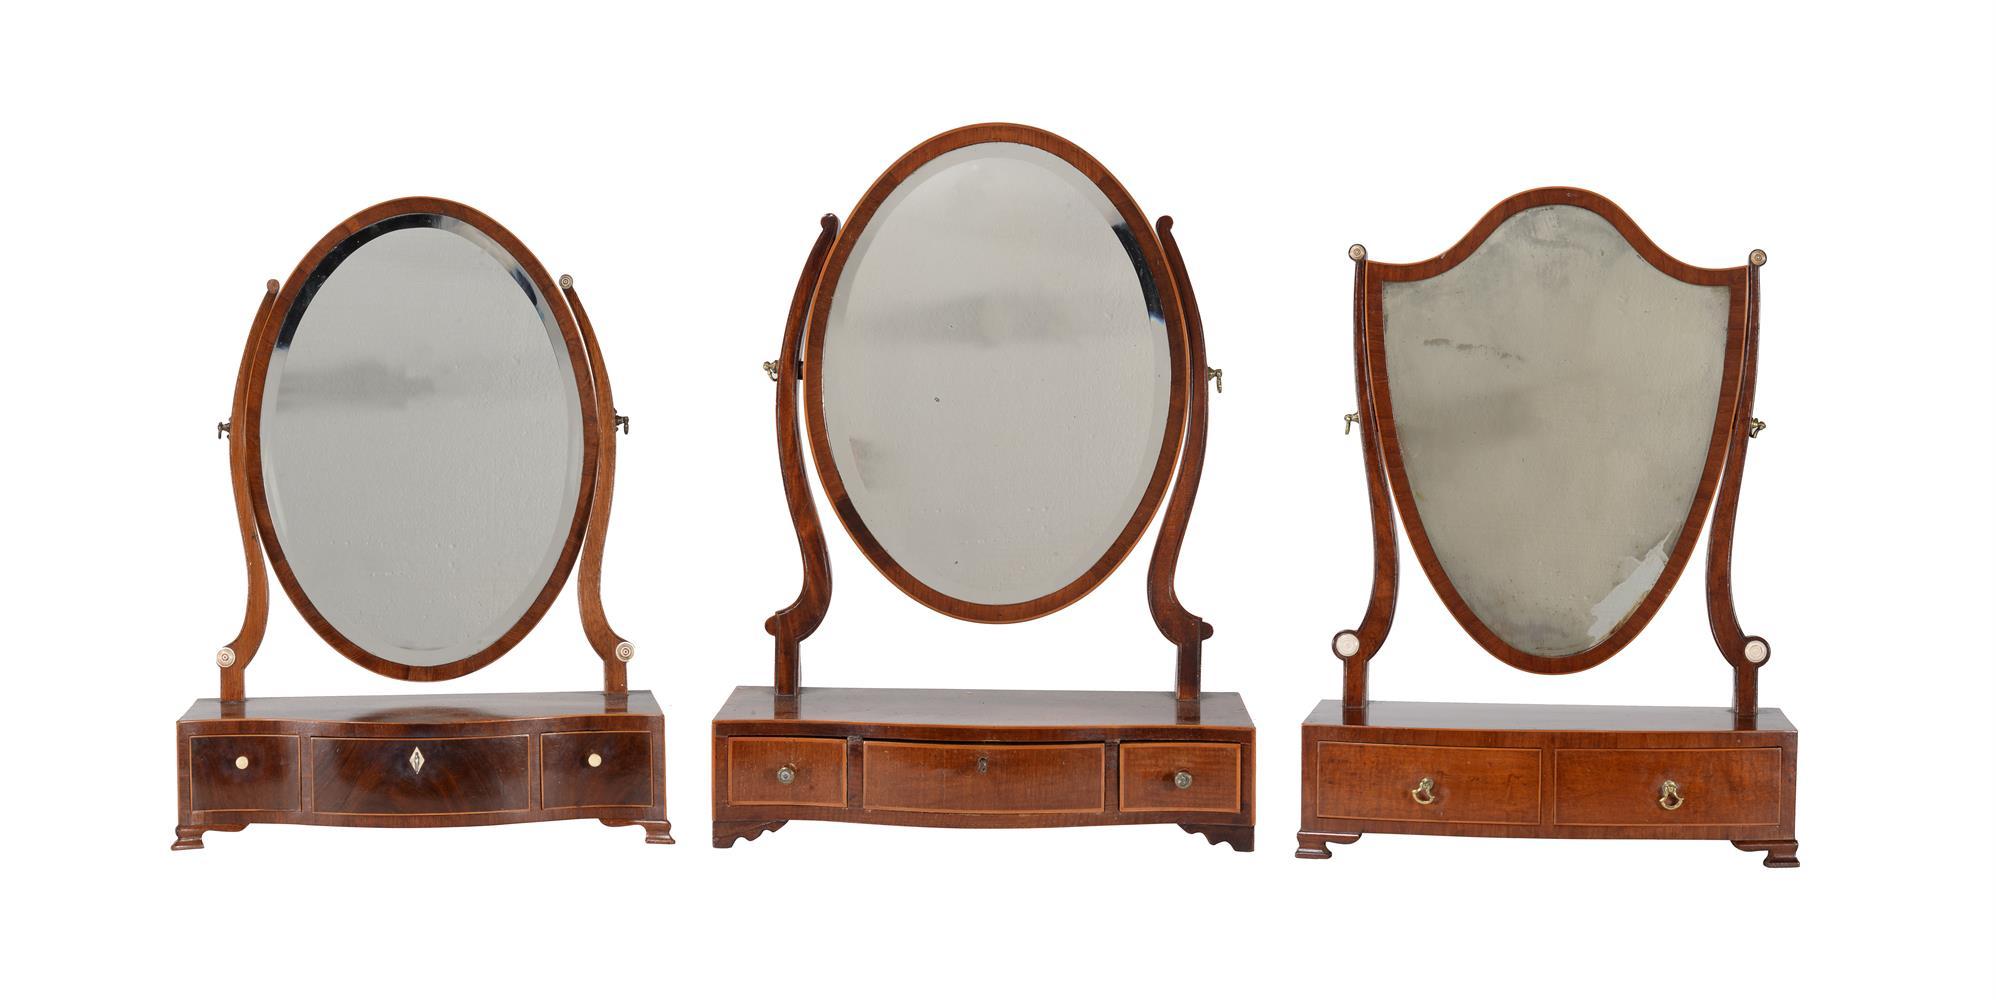 A group of three similar George III mahogany platform dressing mirrors